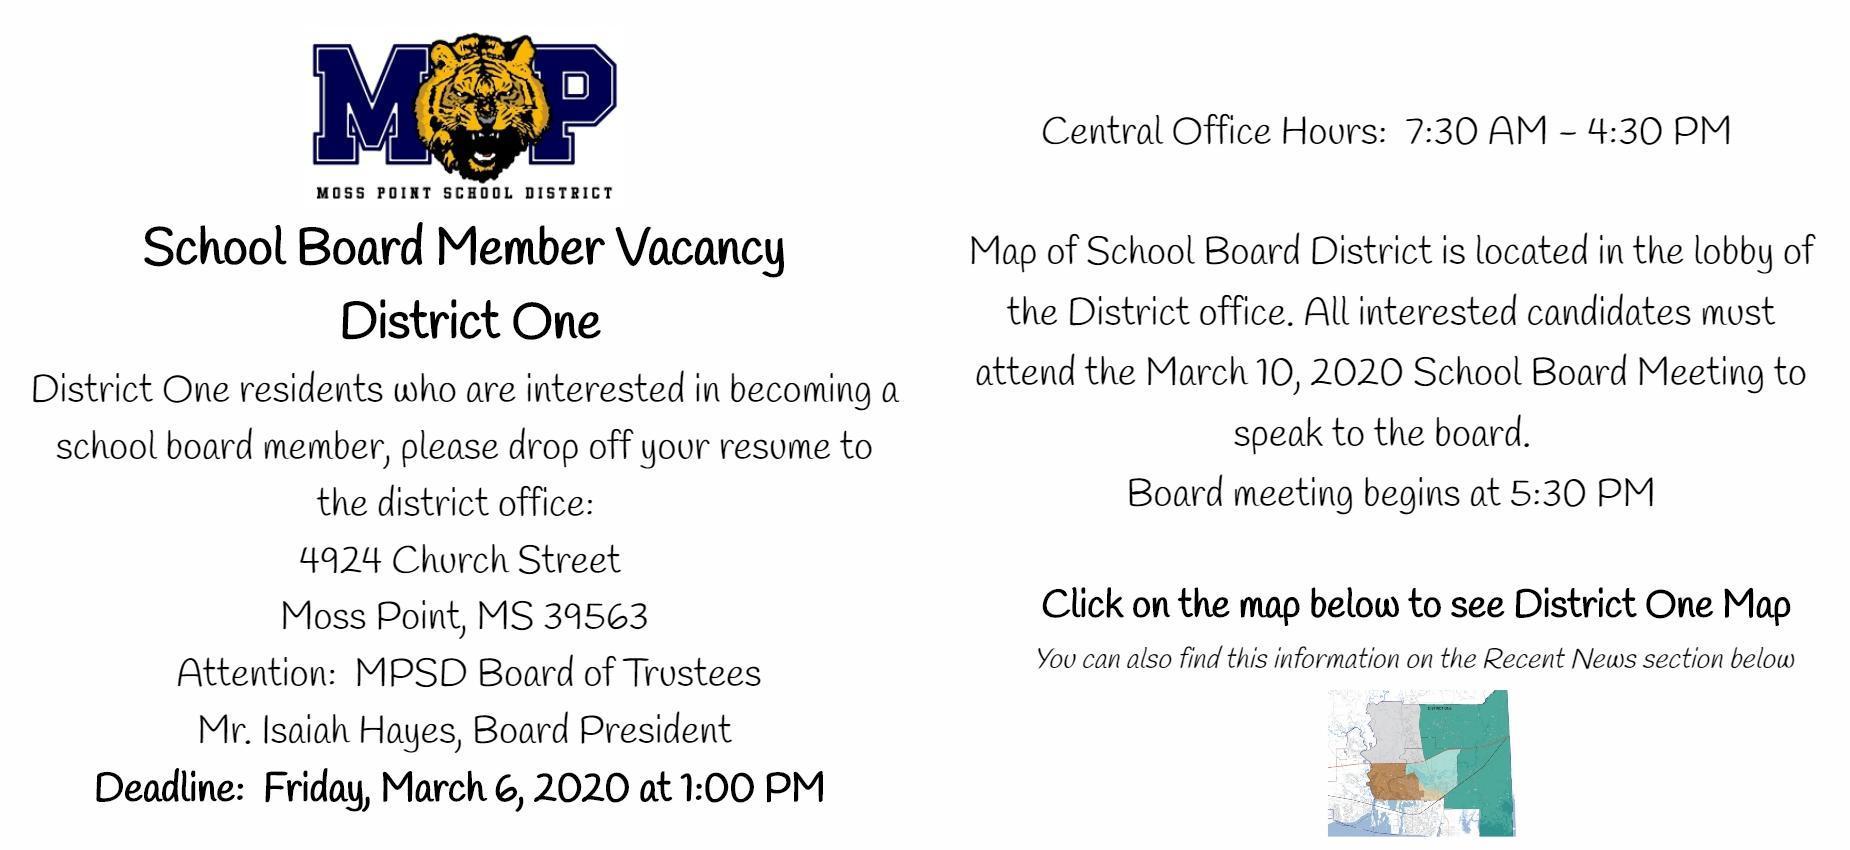 school board member vacancy